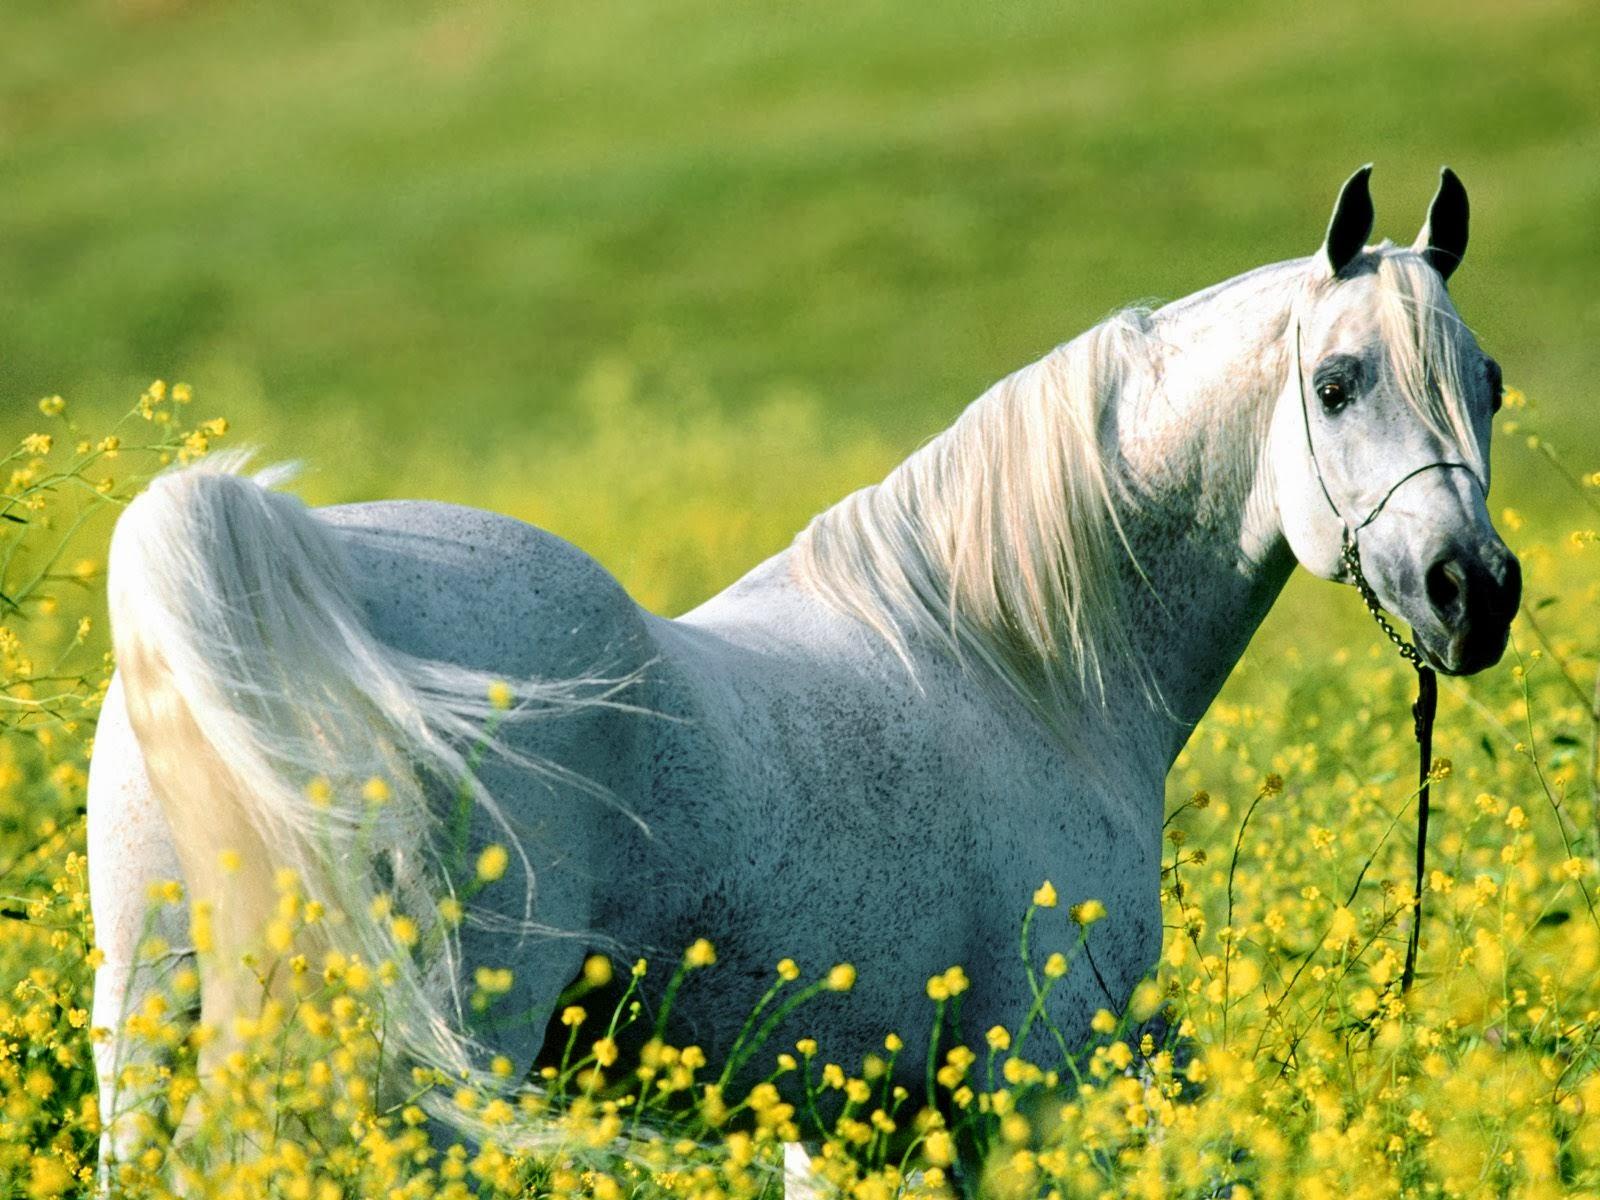 Cool   Wallpaper Horse Watercolor - the-best-top-desktop-horse-wallpapers-32  HD_85837.jpg